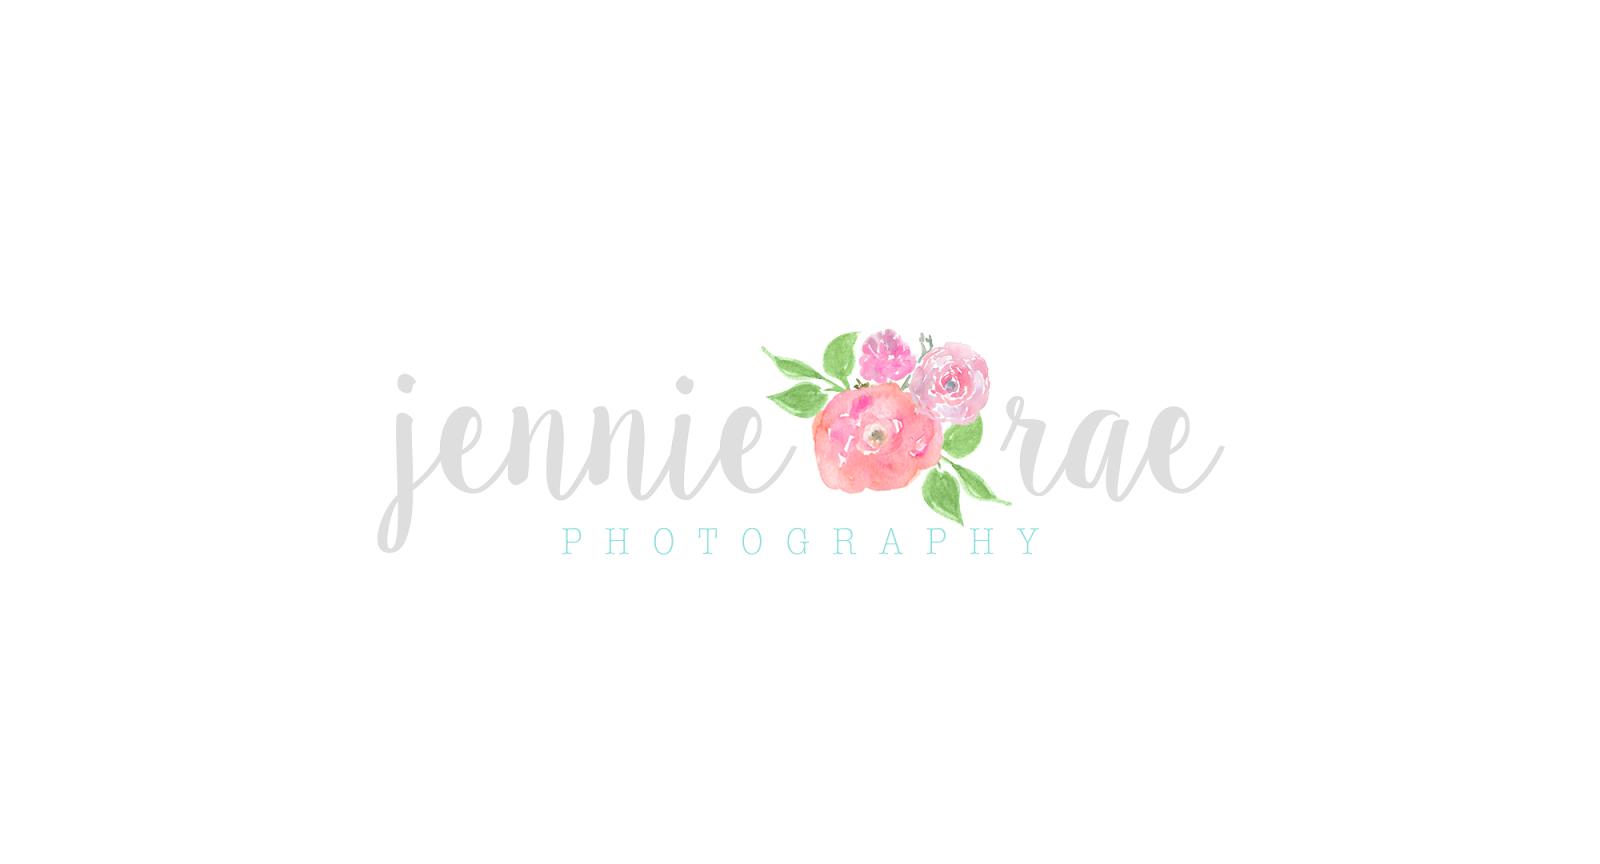 Jennie Rae Photography